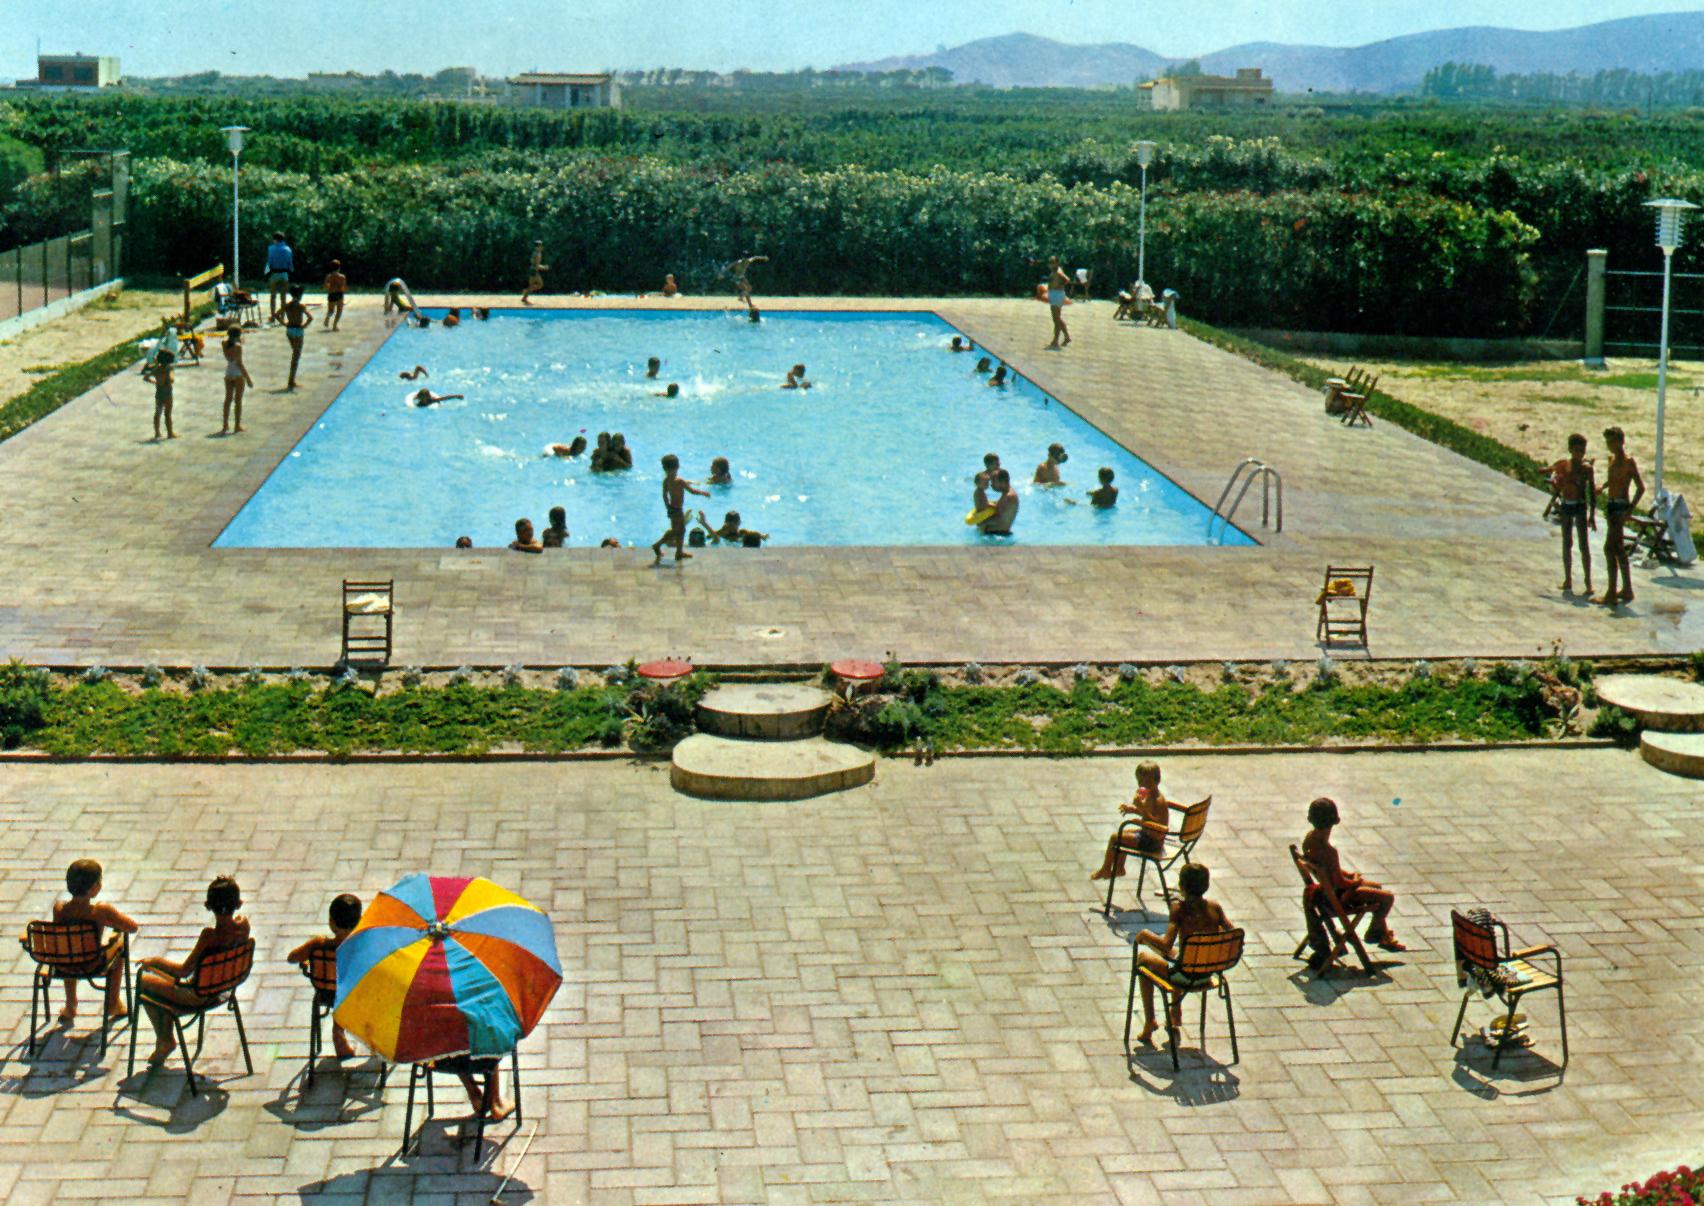 Foto playa Mareny de Sant Llorenç. Urbanització Mareny Blau. Anys 70